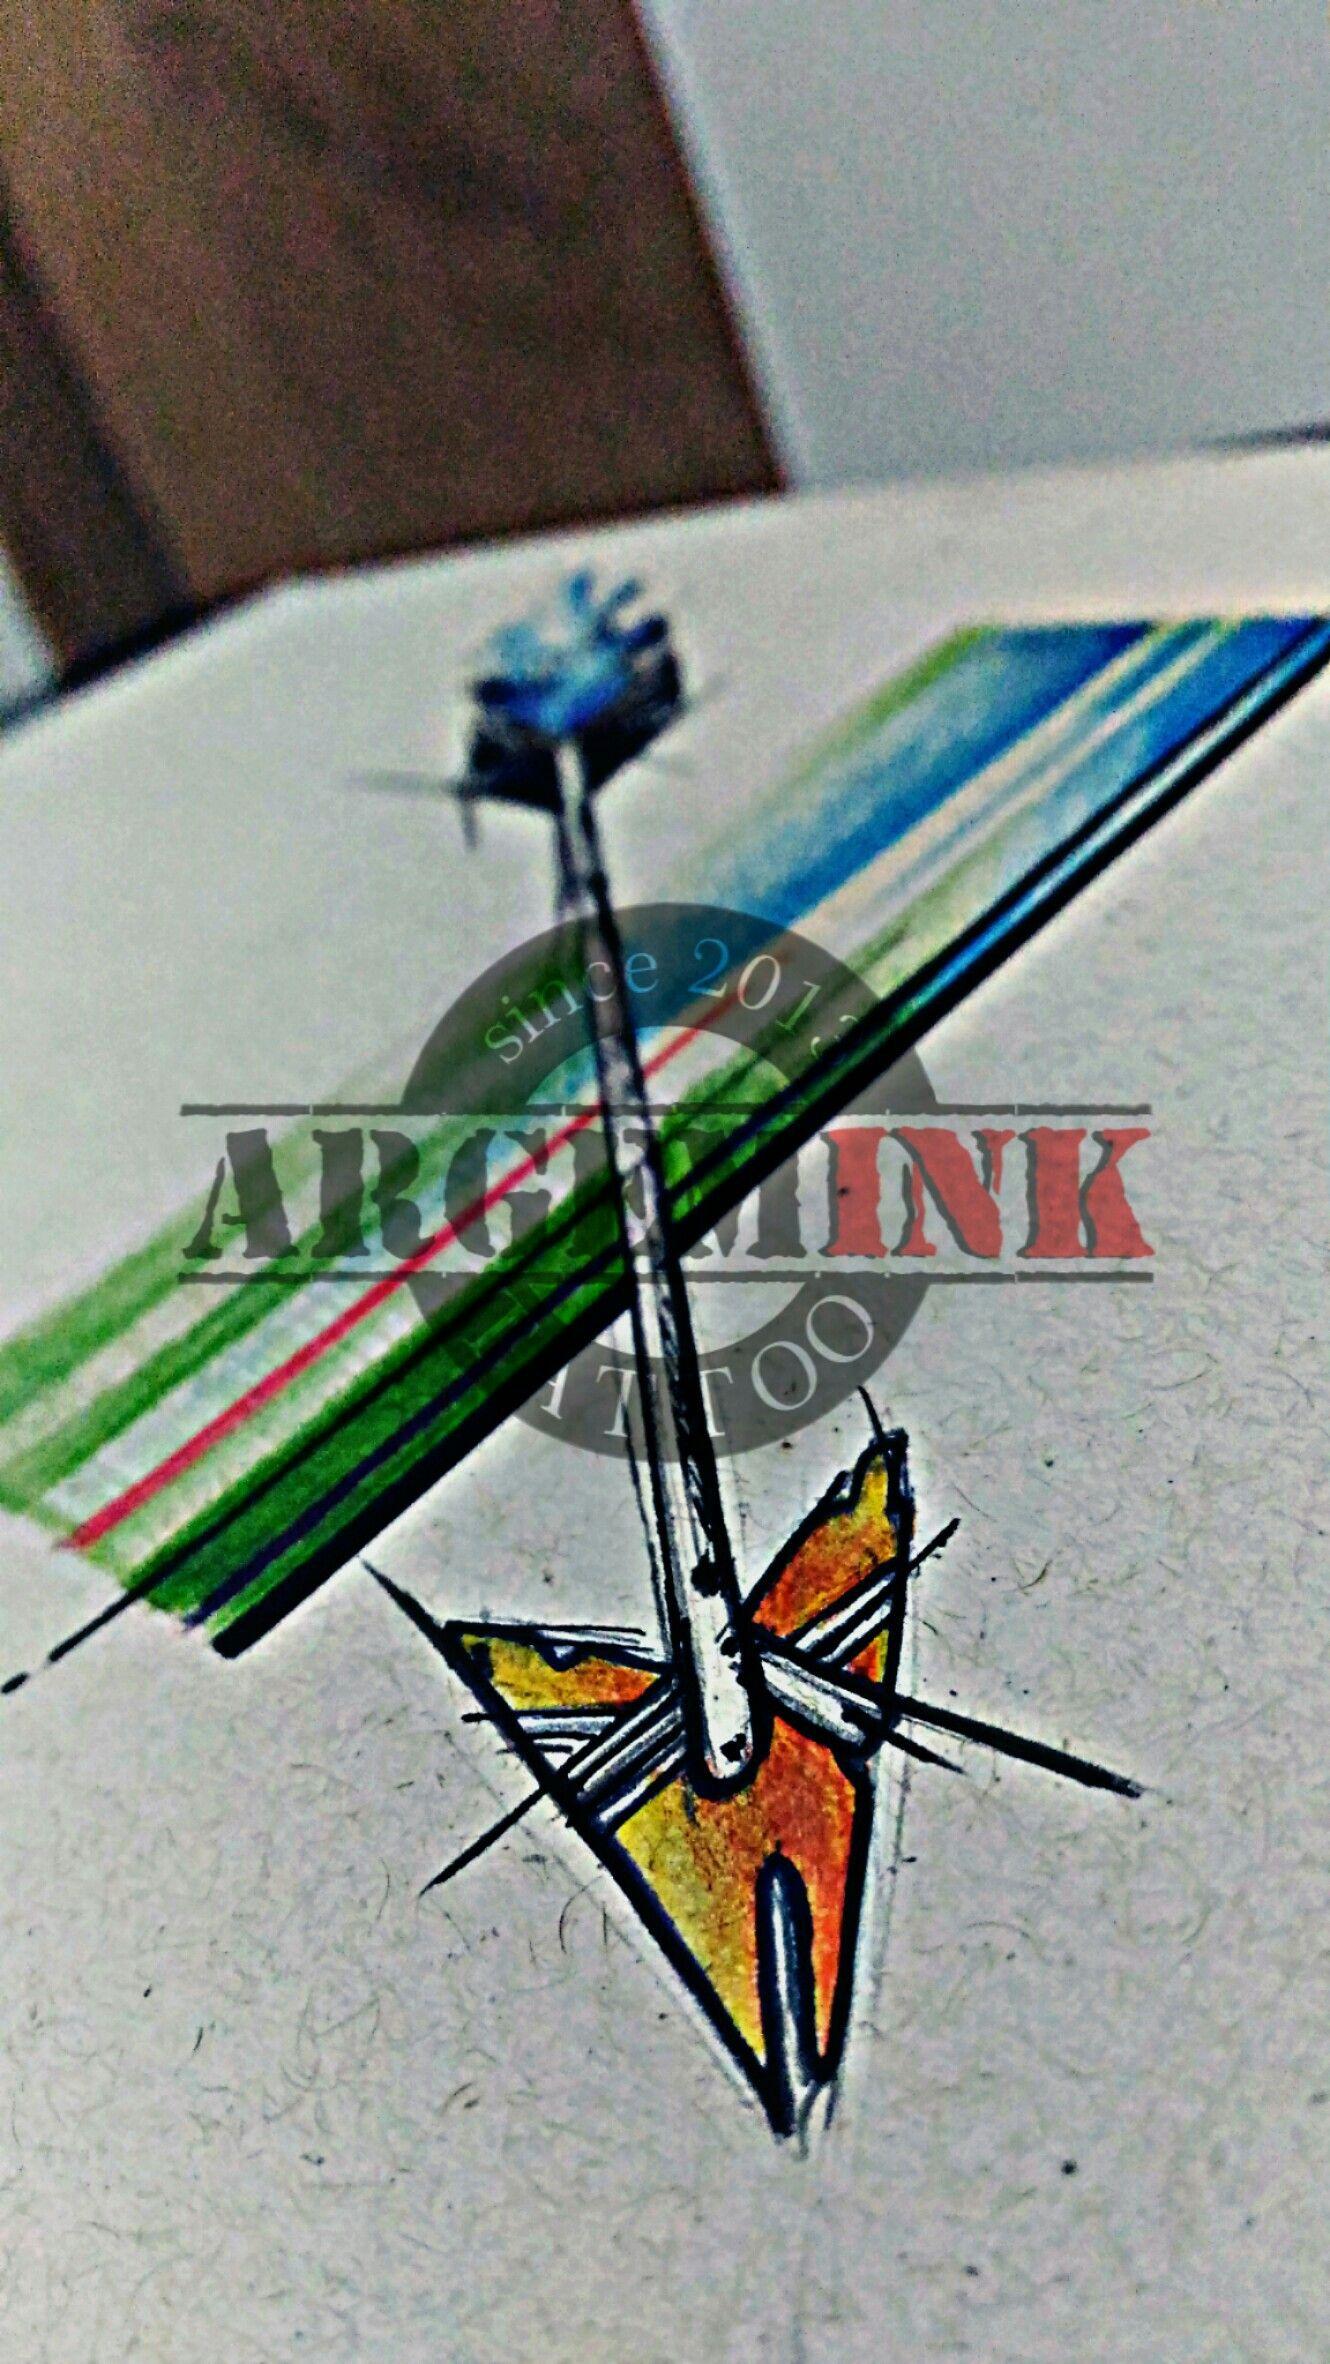 #flecha #flechatattoo #colortattoo #rj